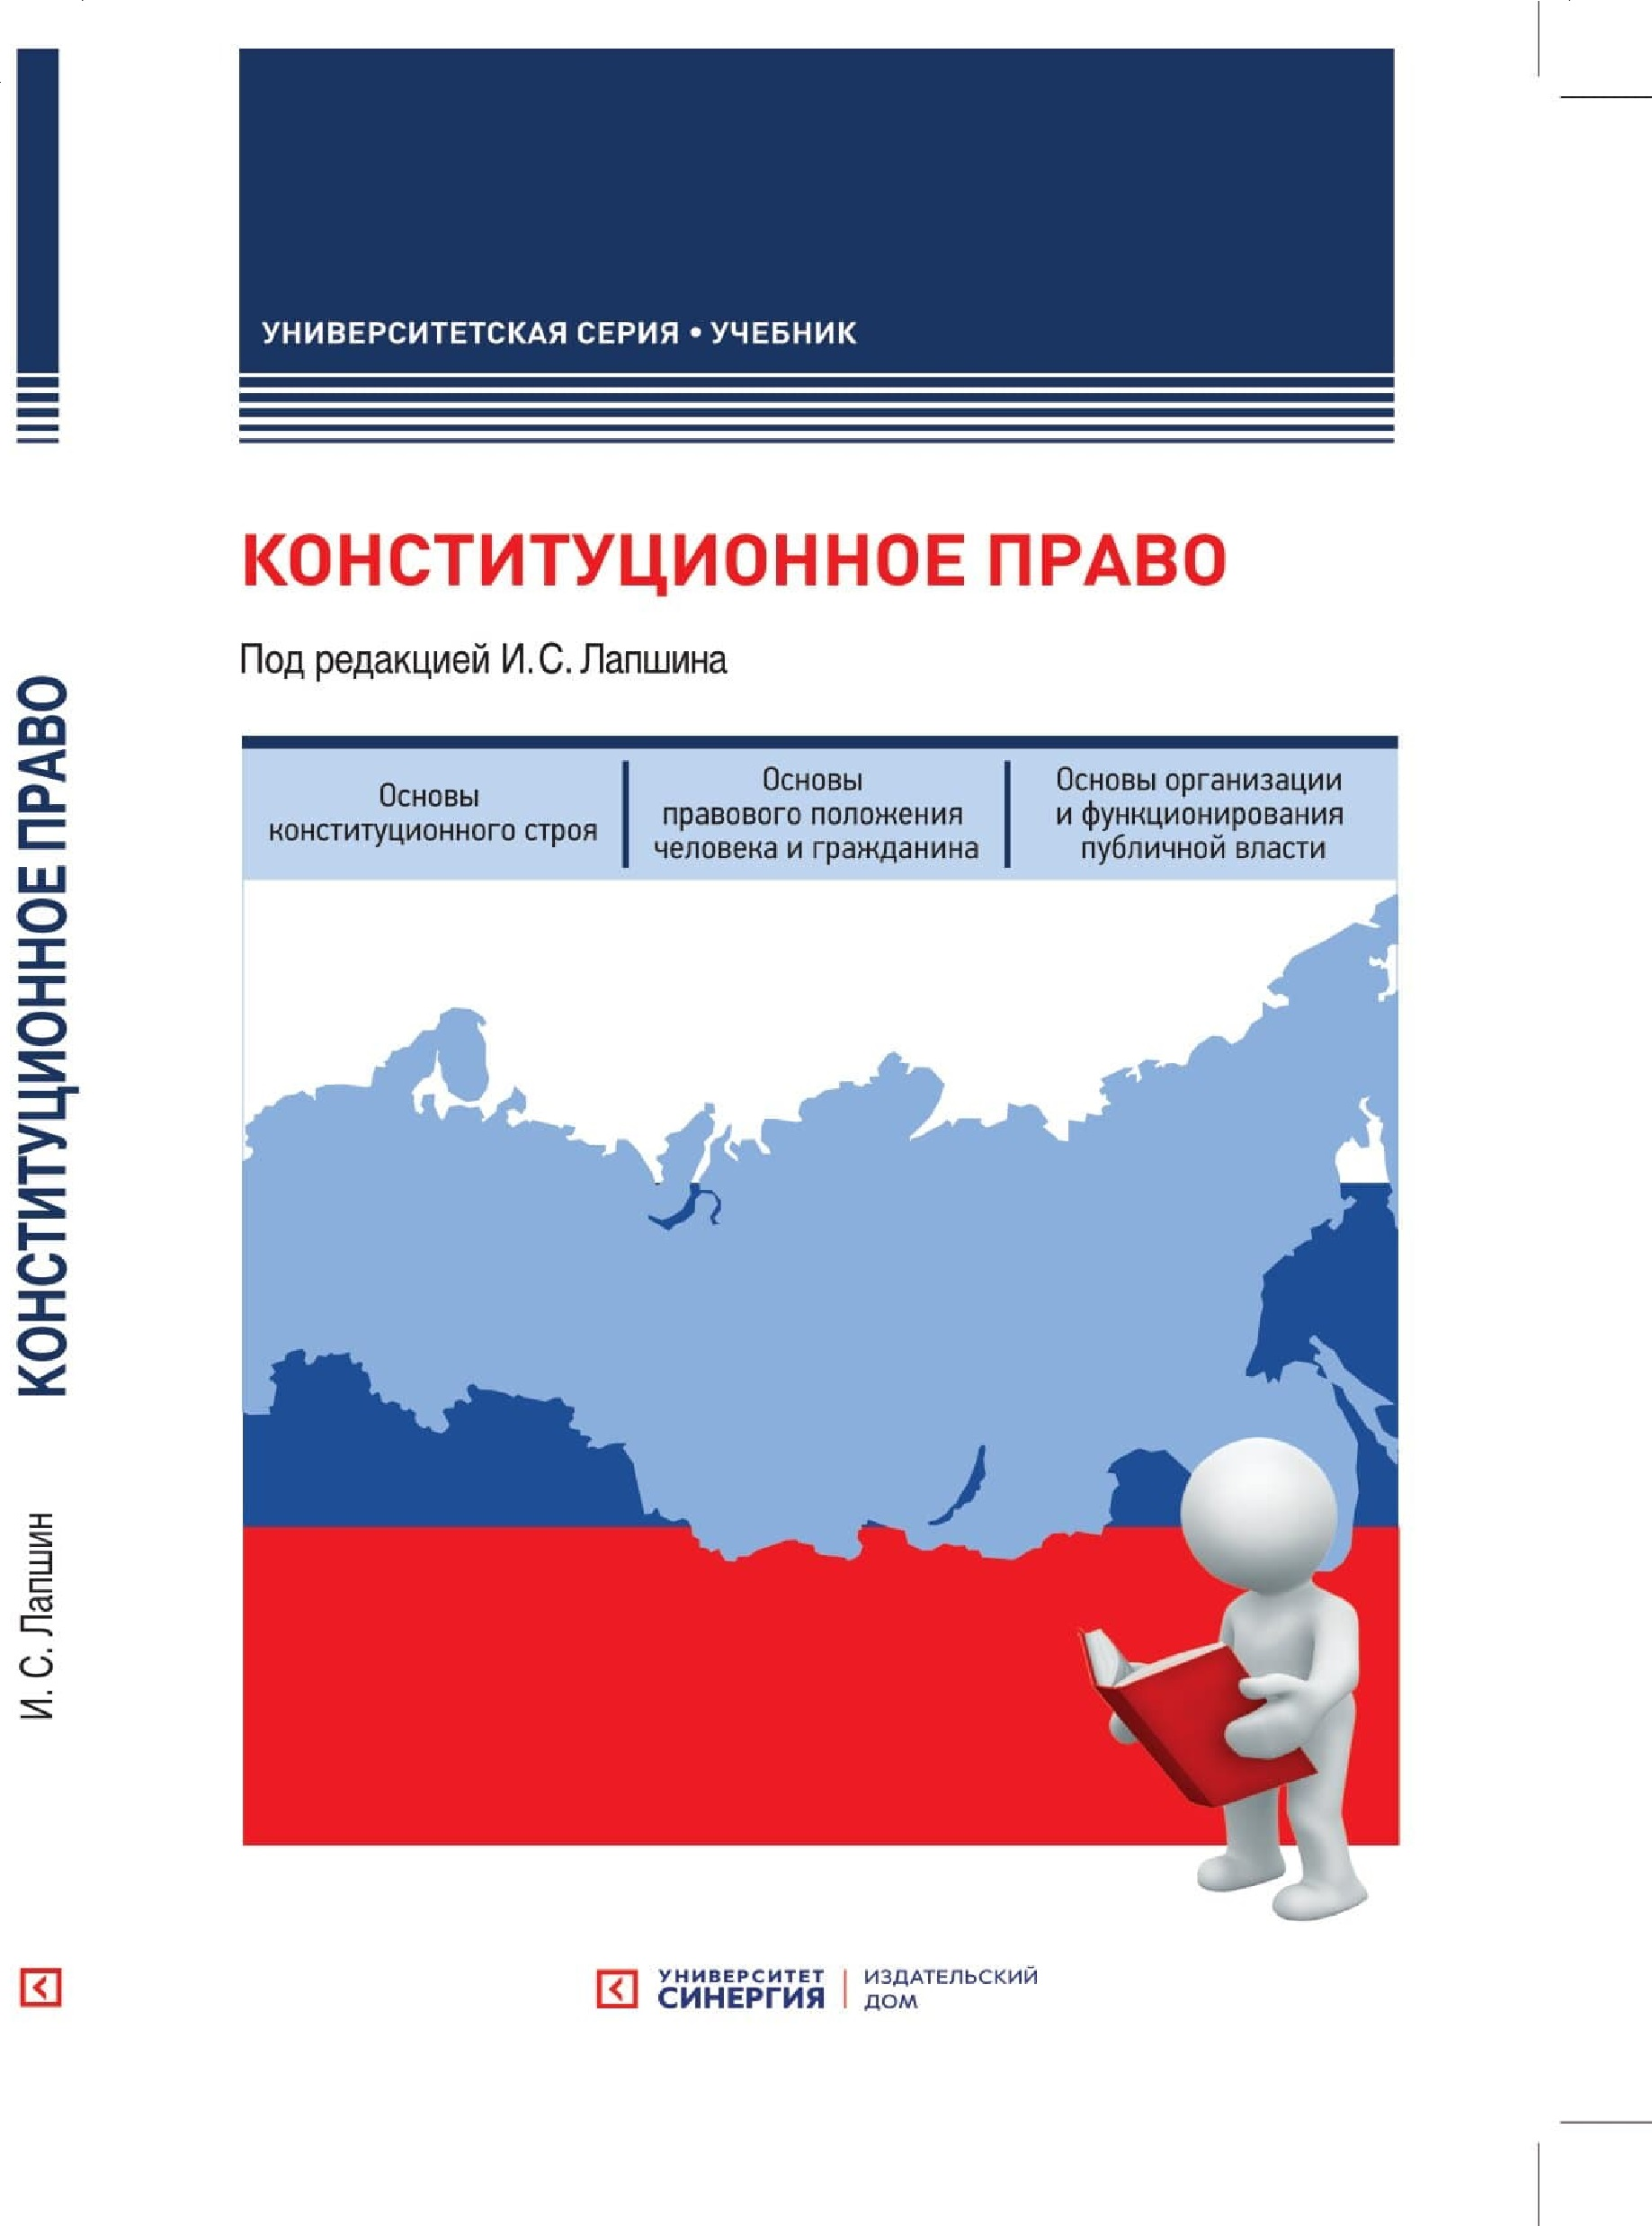 Конституционное право: Учебник. ISBN 978–5–4257–0501–3